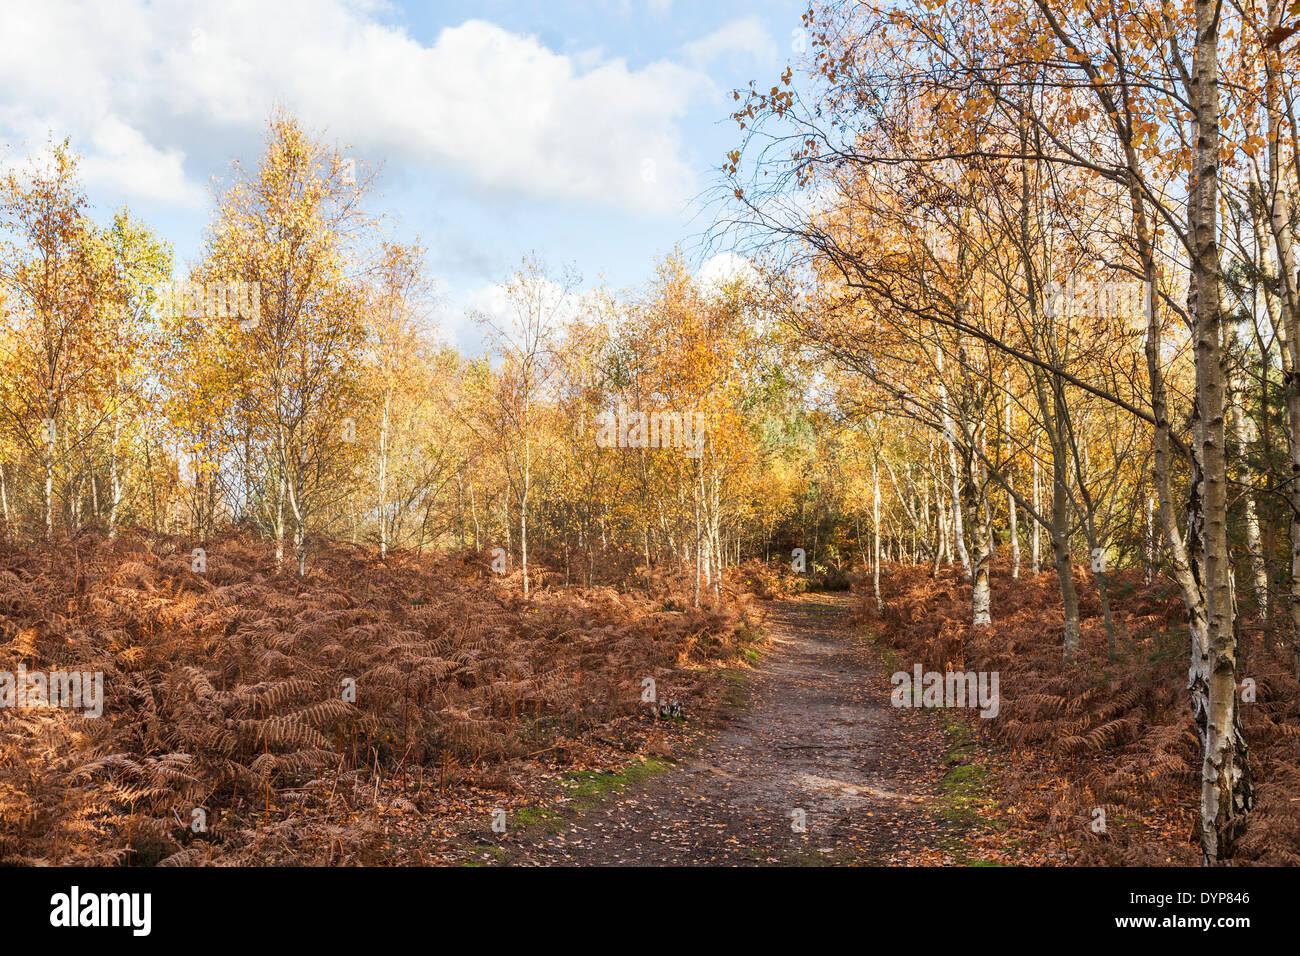 Woodland path through silver birch trees in bright autumn colours with brown bracken at Frensham Pond, Surrey, UK Stock Photo